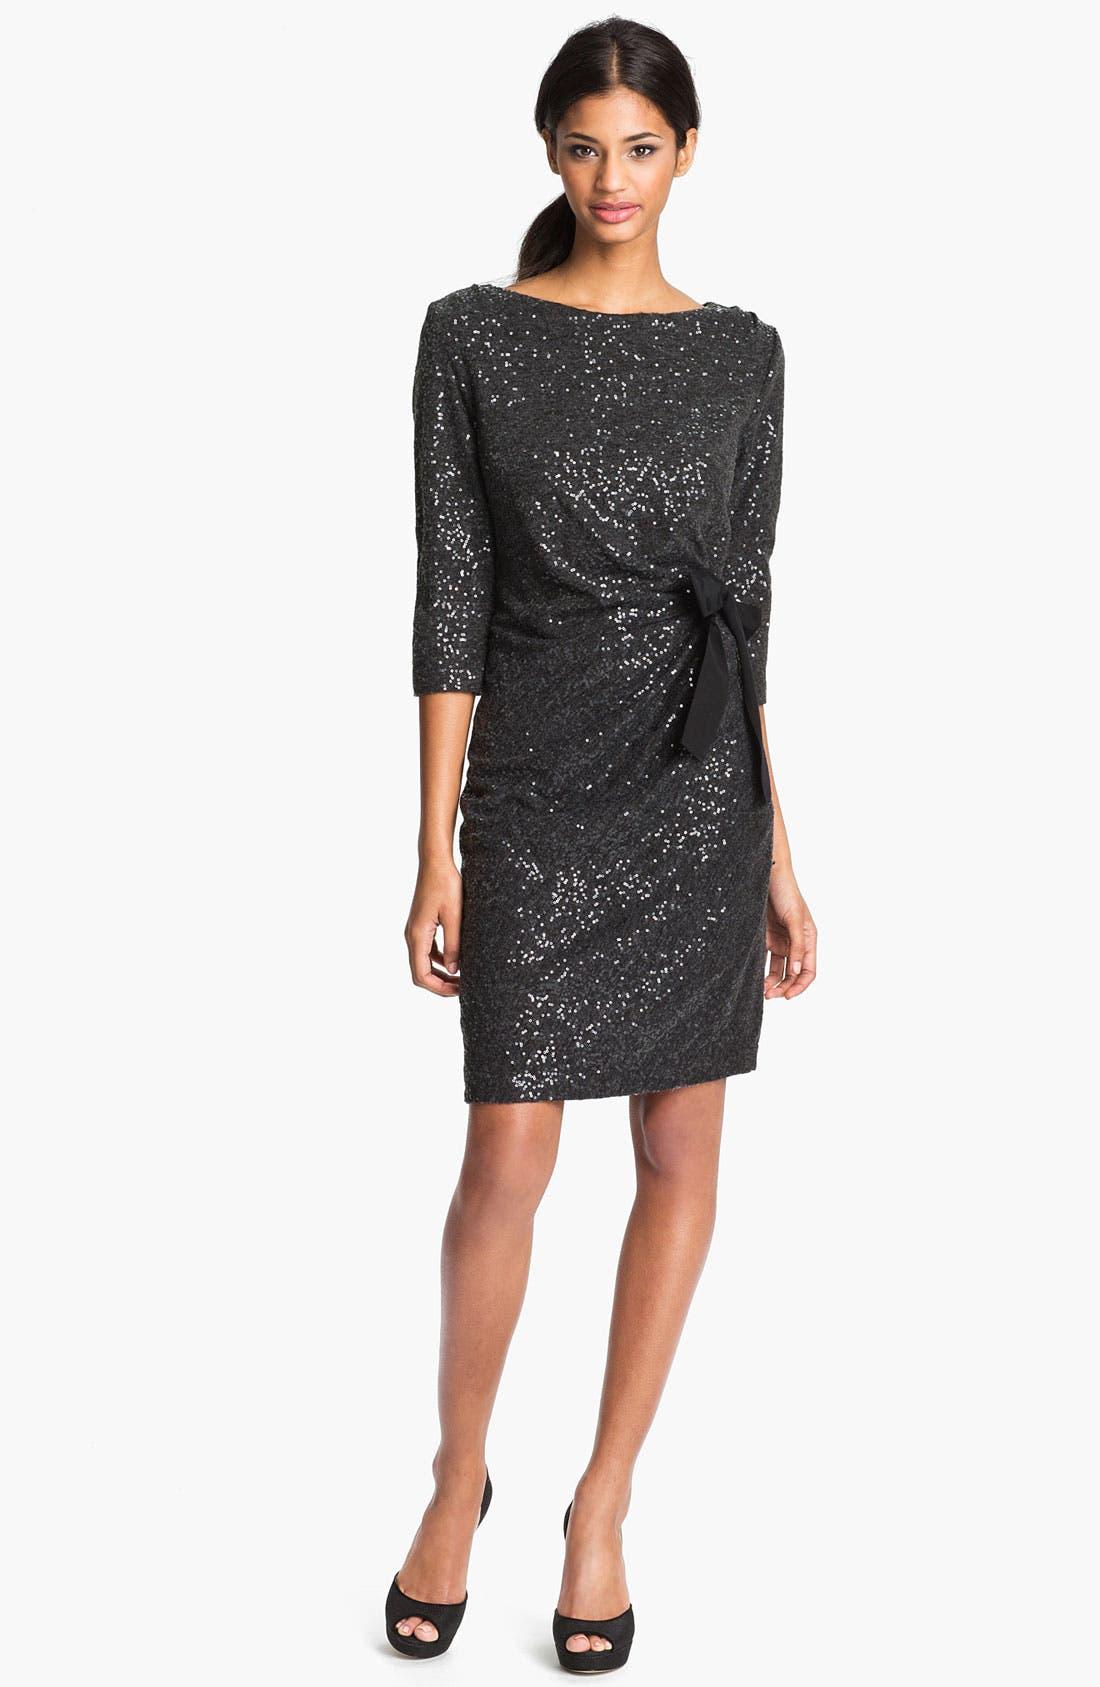 Alternate Image 1 Selected - Taylor Dresses Side Tie Sequin Sweater Dress